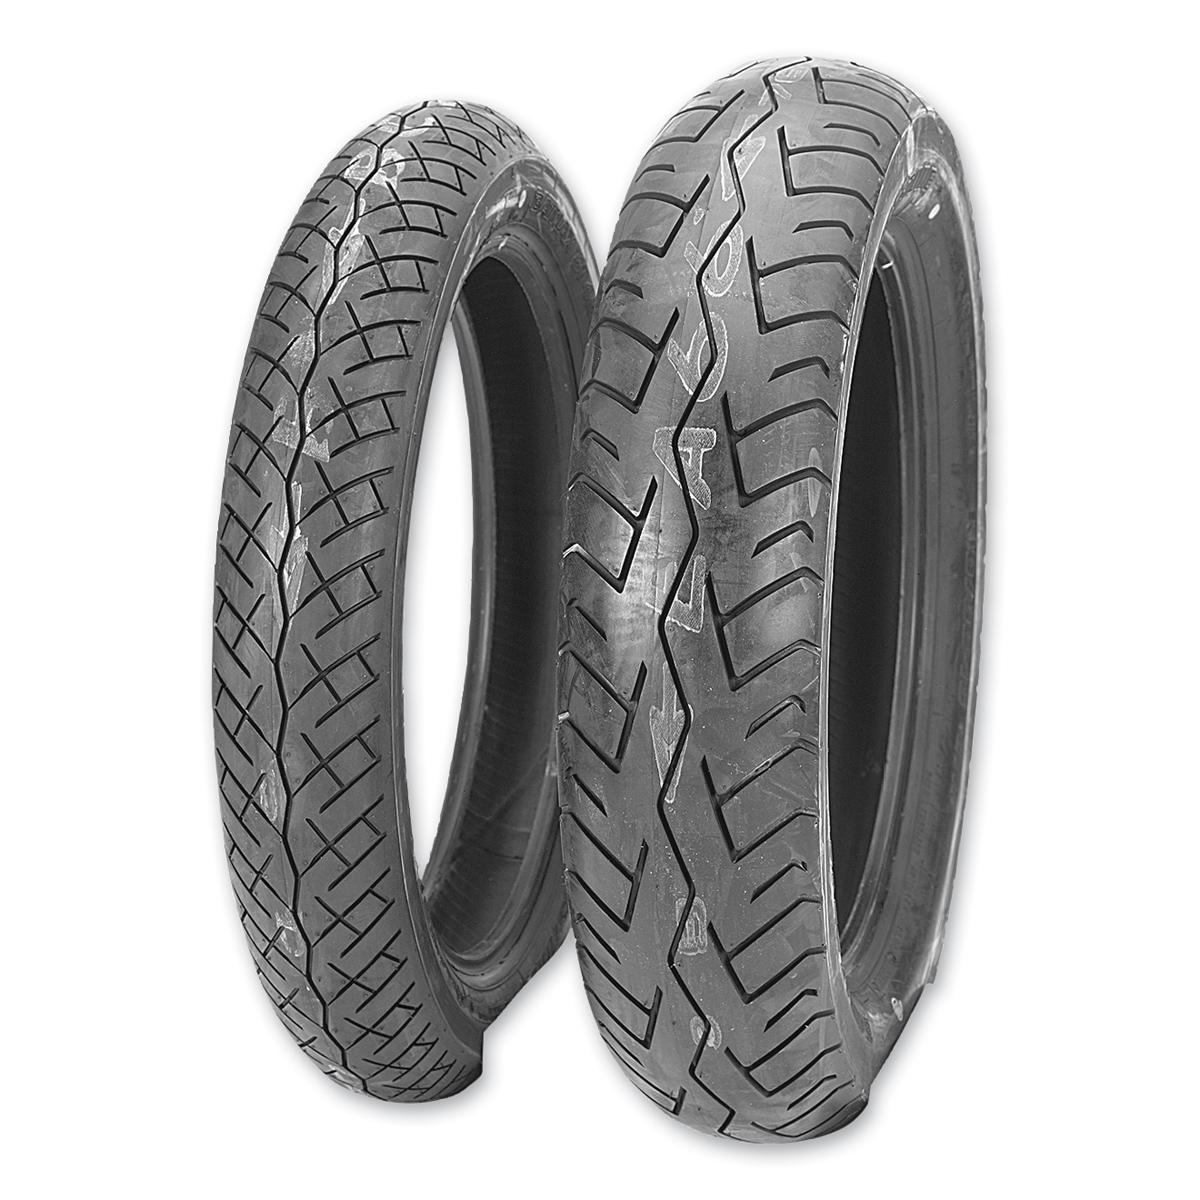 Bridgestone BT54 140/70R18 Rear Tire